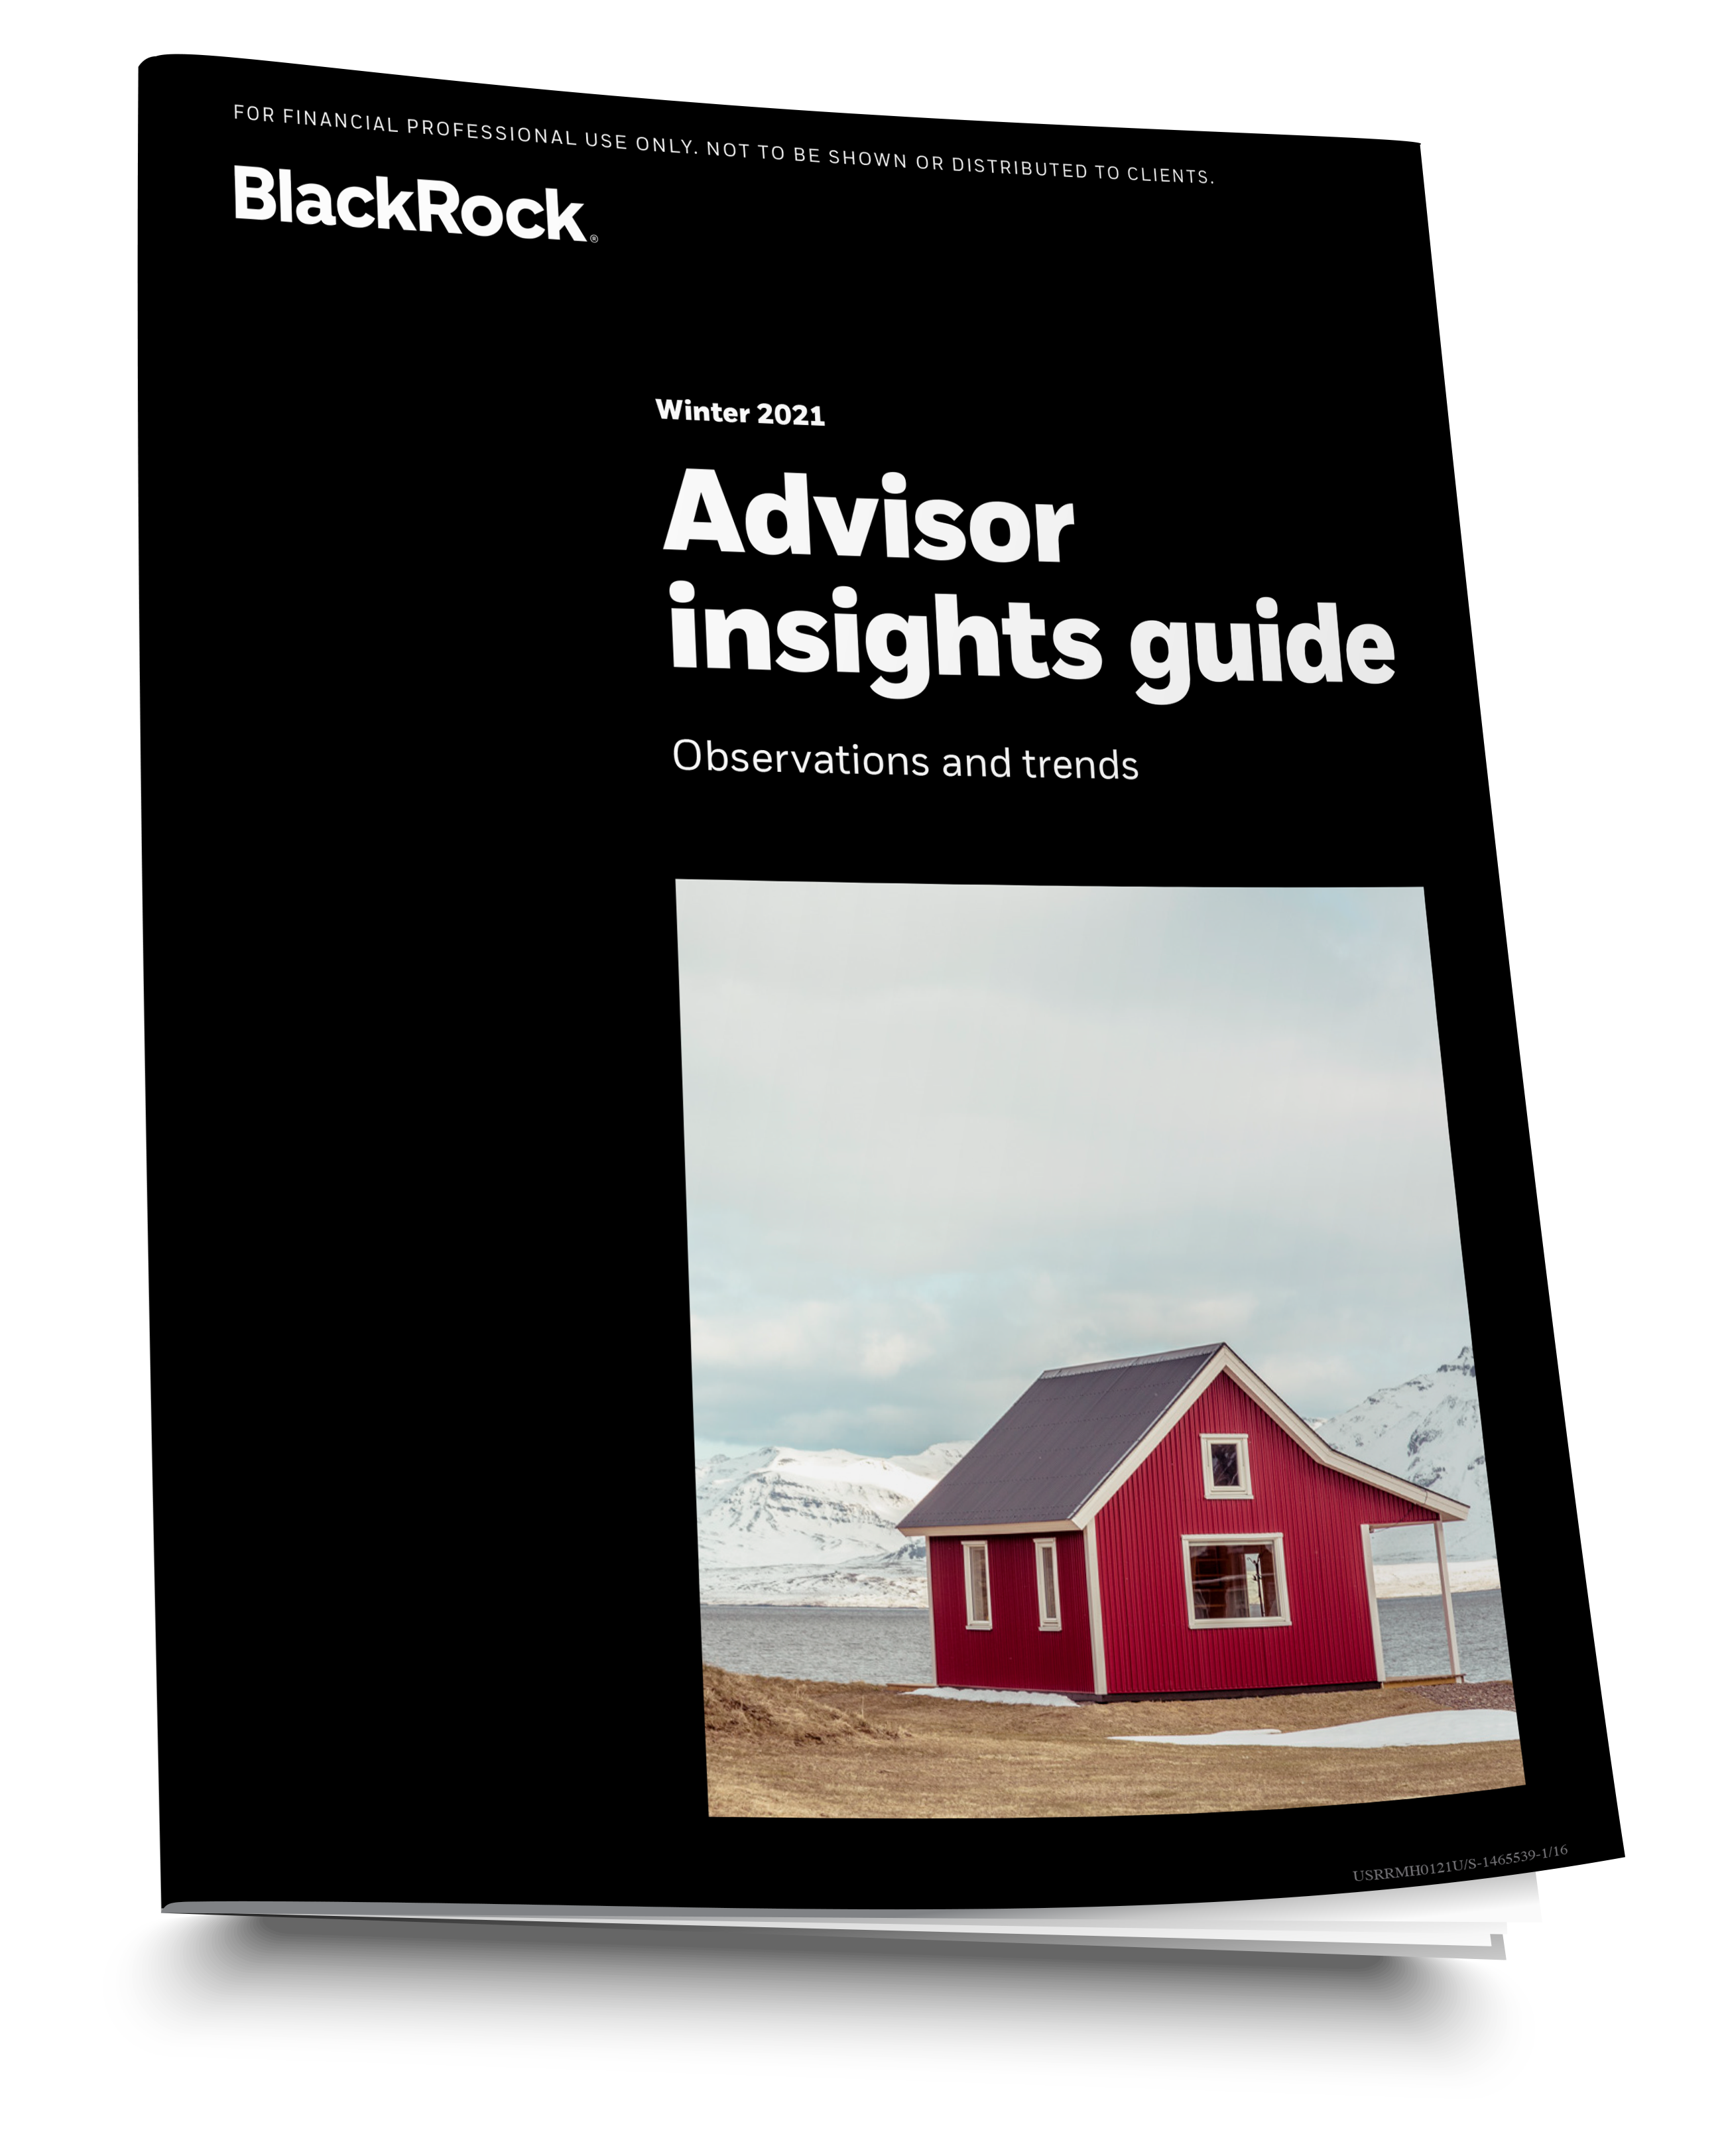 Read Winter 2021 Advisor Insights Guide